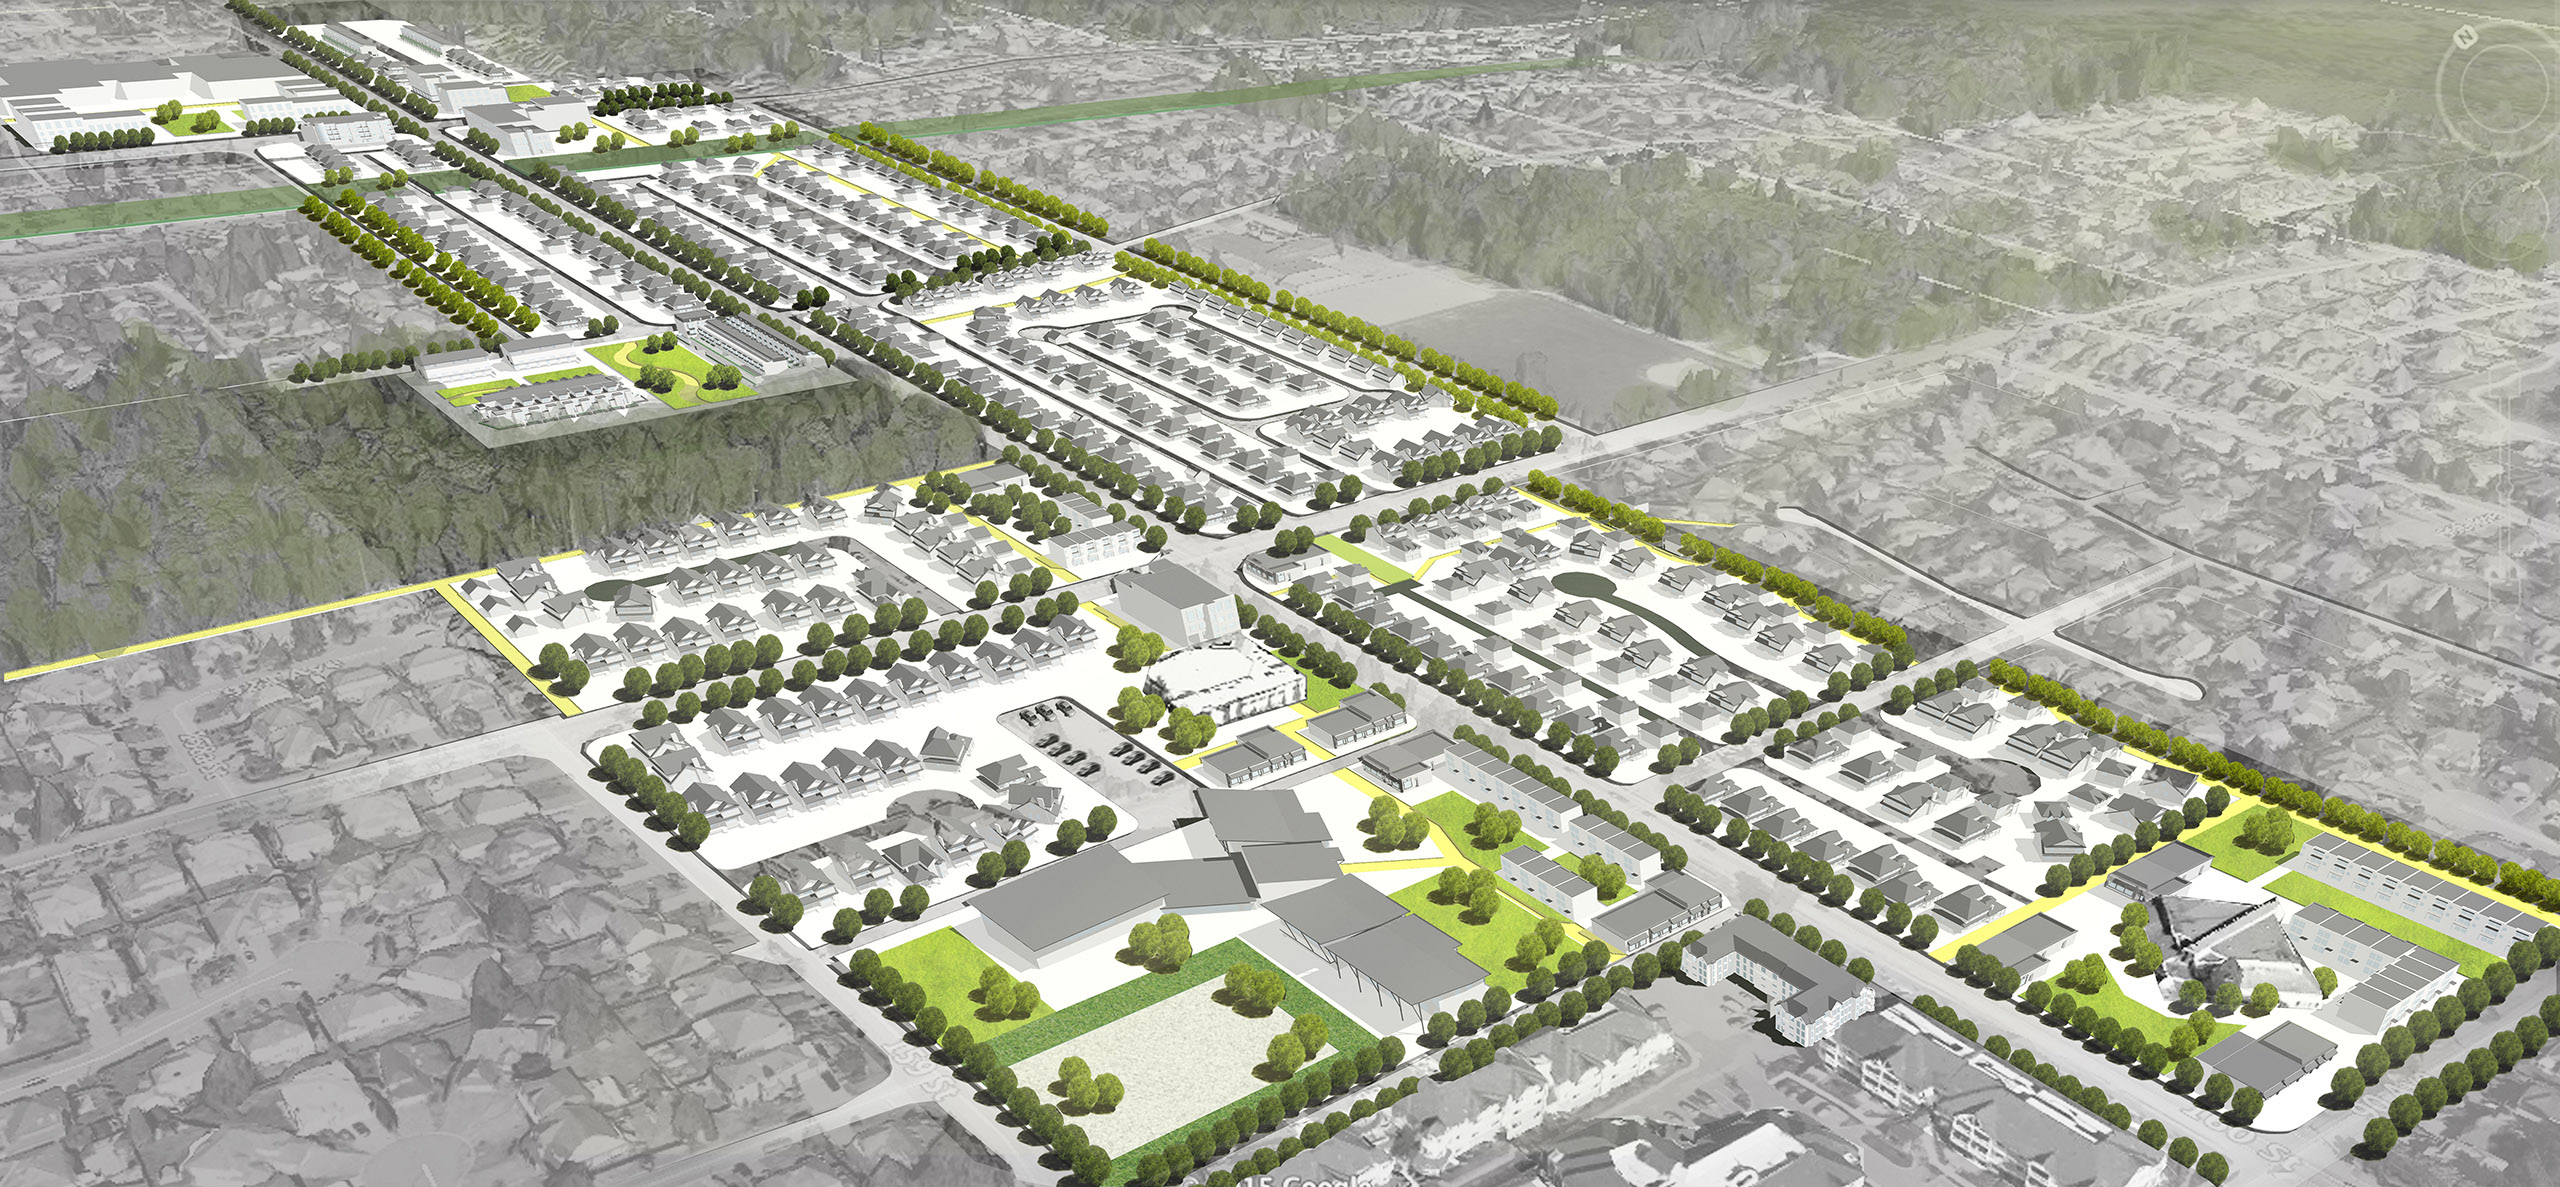 Urban design prototypes for the City of Surrey | sala.ubc.ca